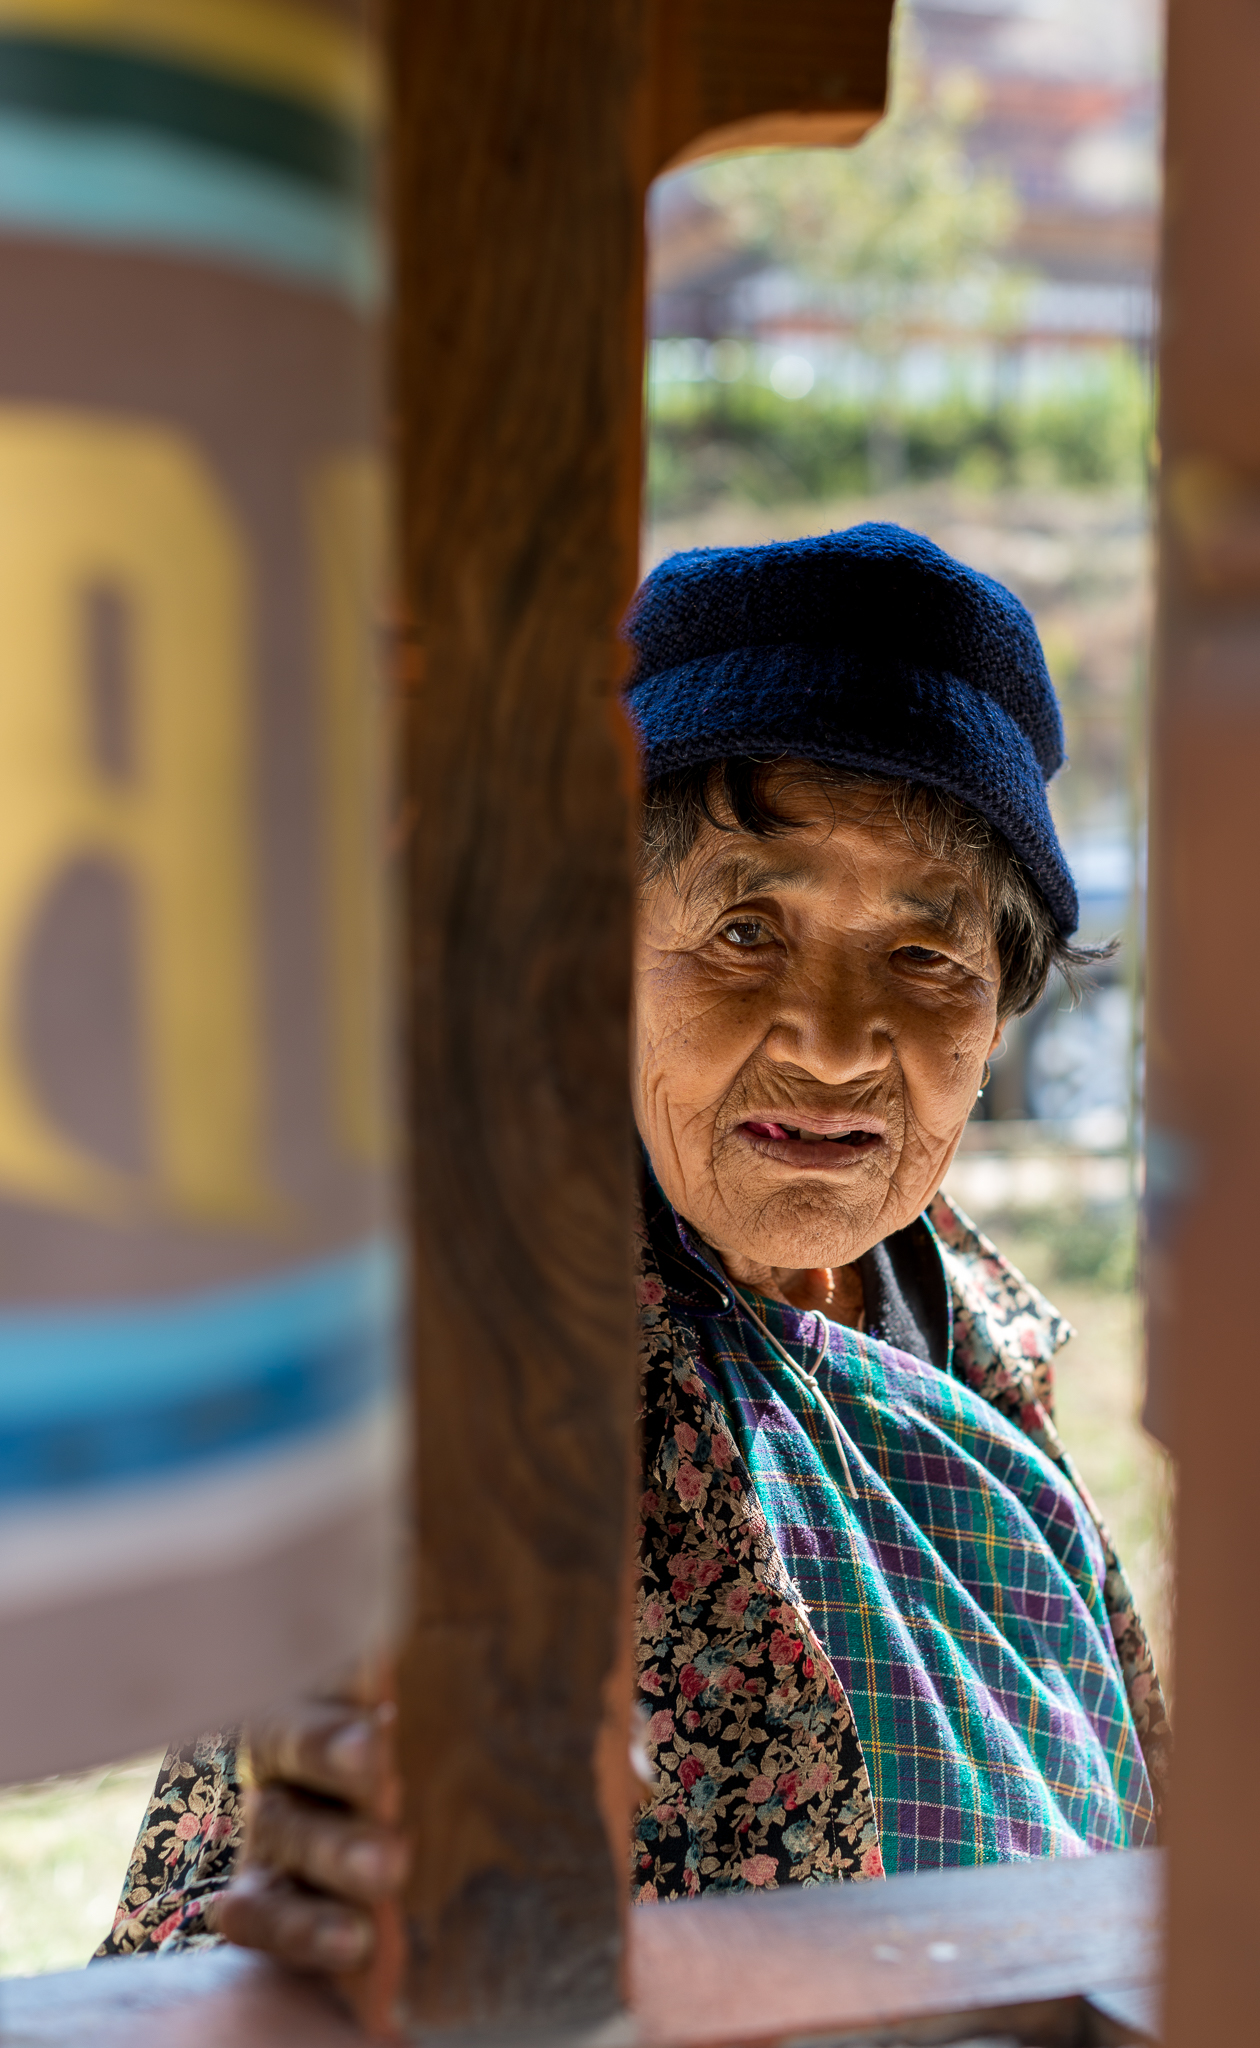 84 year old woman we met at the prayer wheels